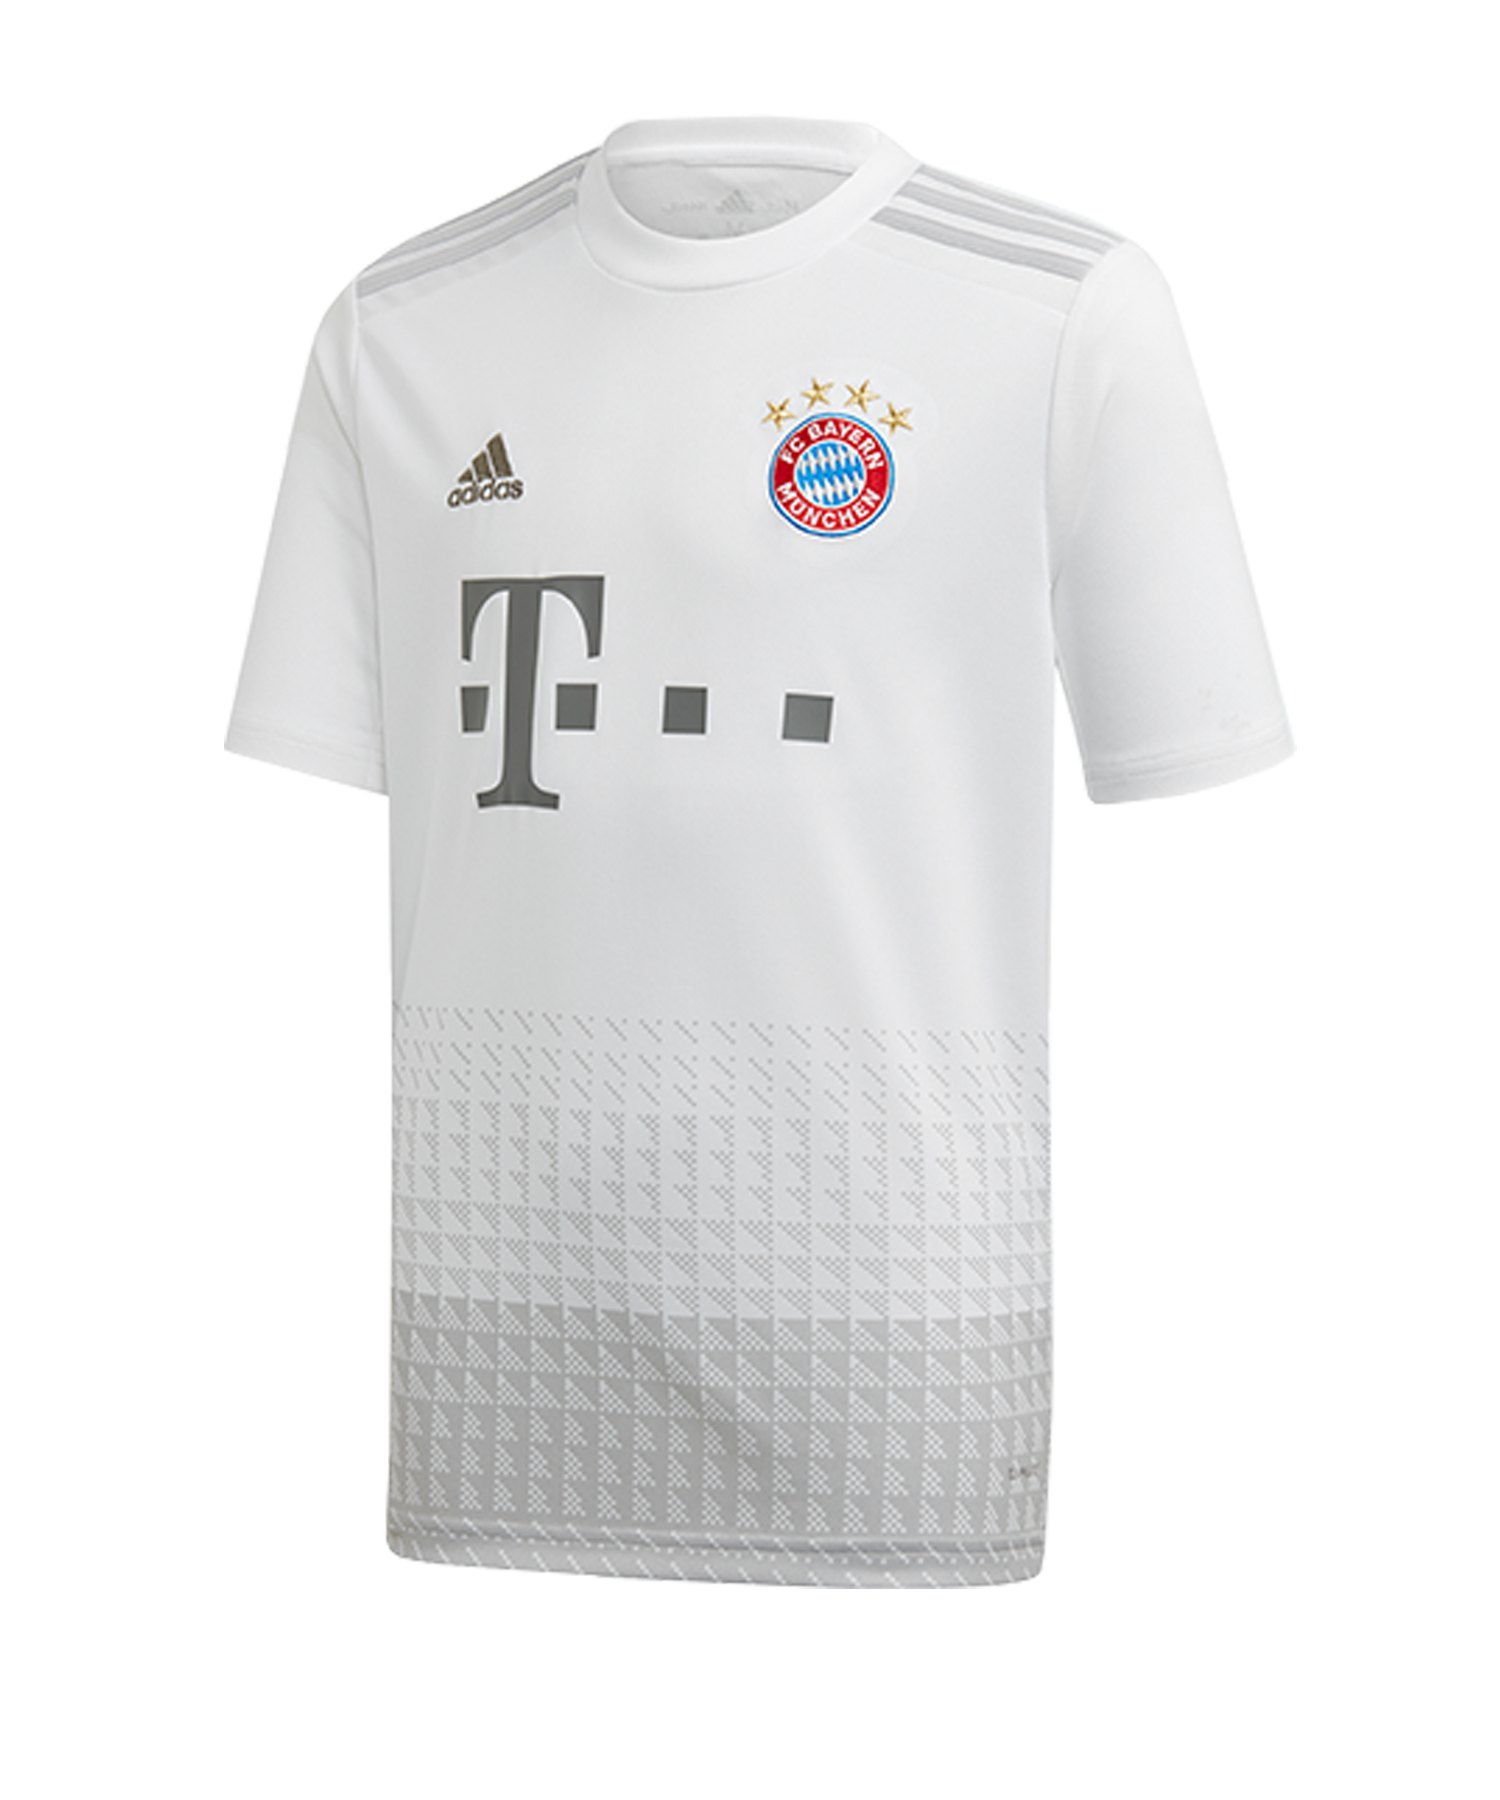 adidas FC Bayern München Trikot Away 2019/20 Kids - Weiss